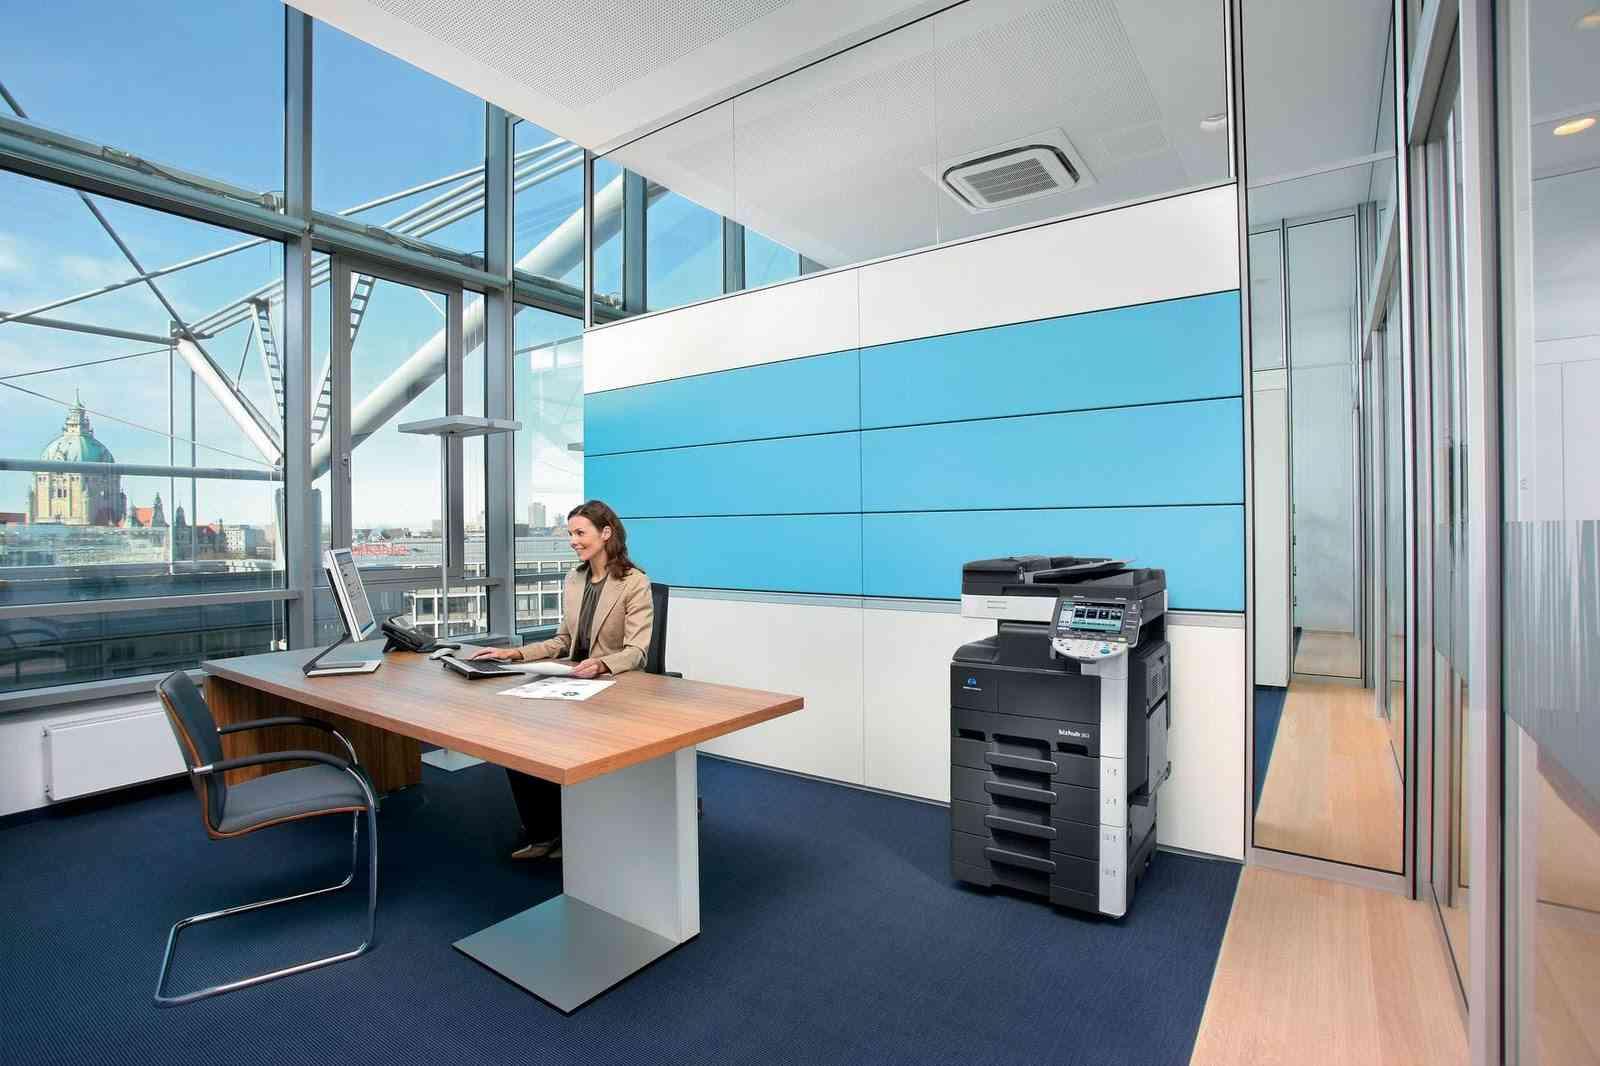 Consigue una oficina con estilo moderno for Fotos de oficinas modernas